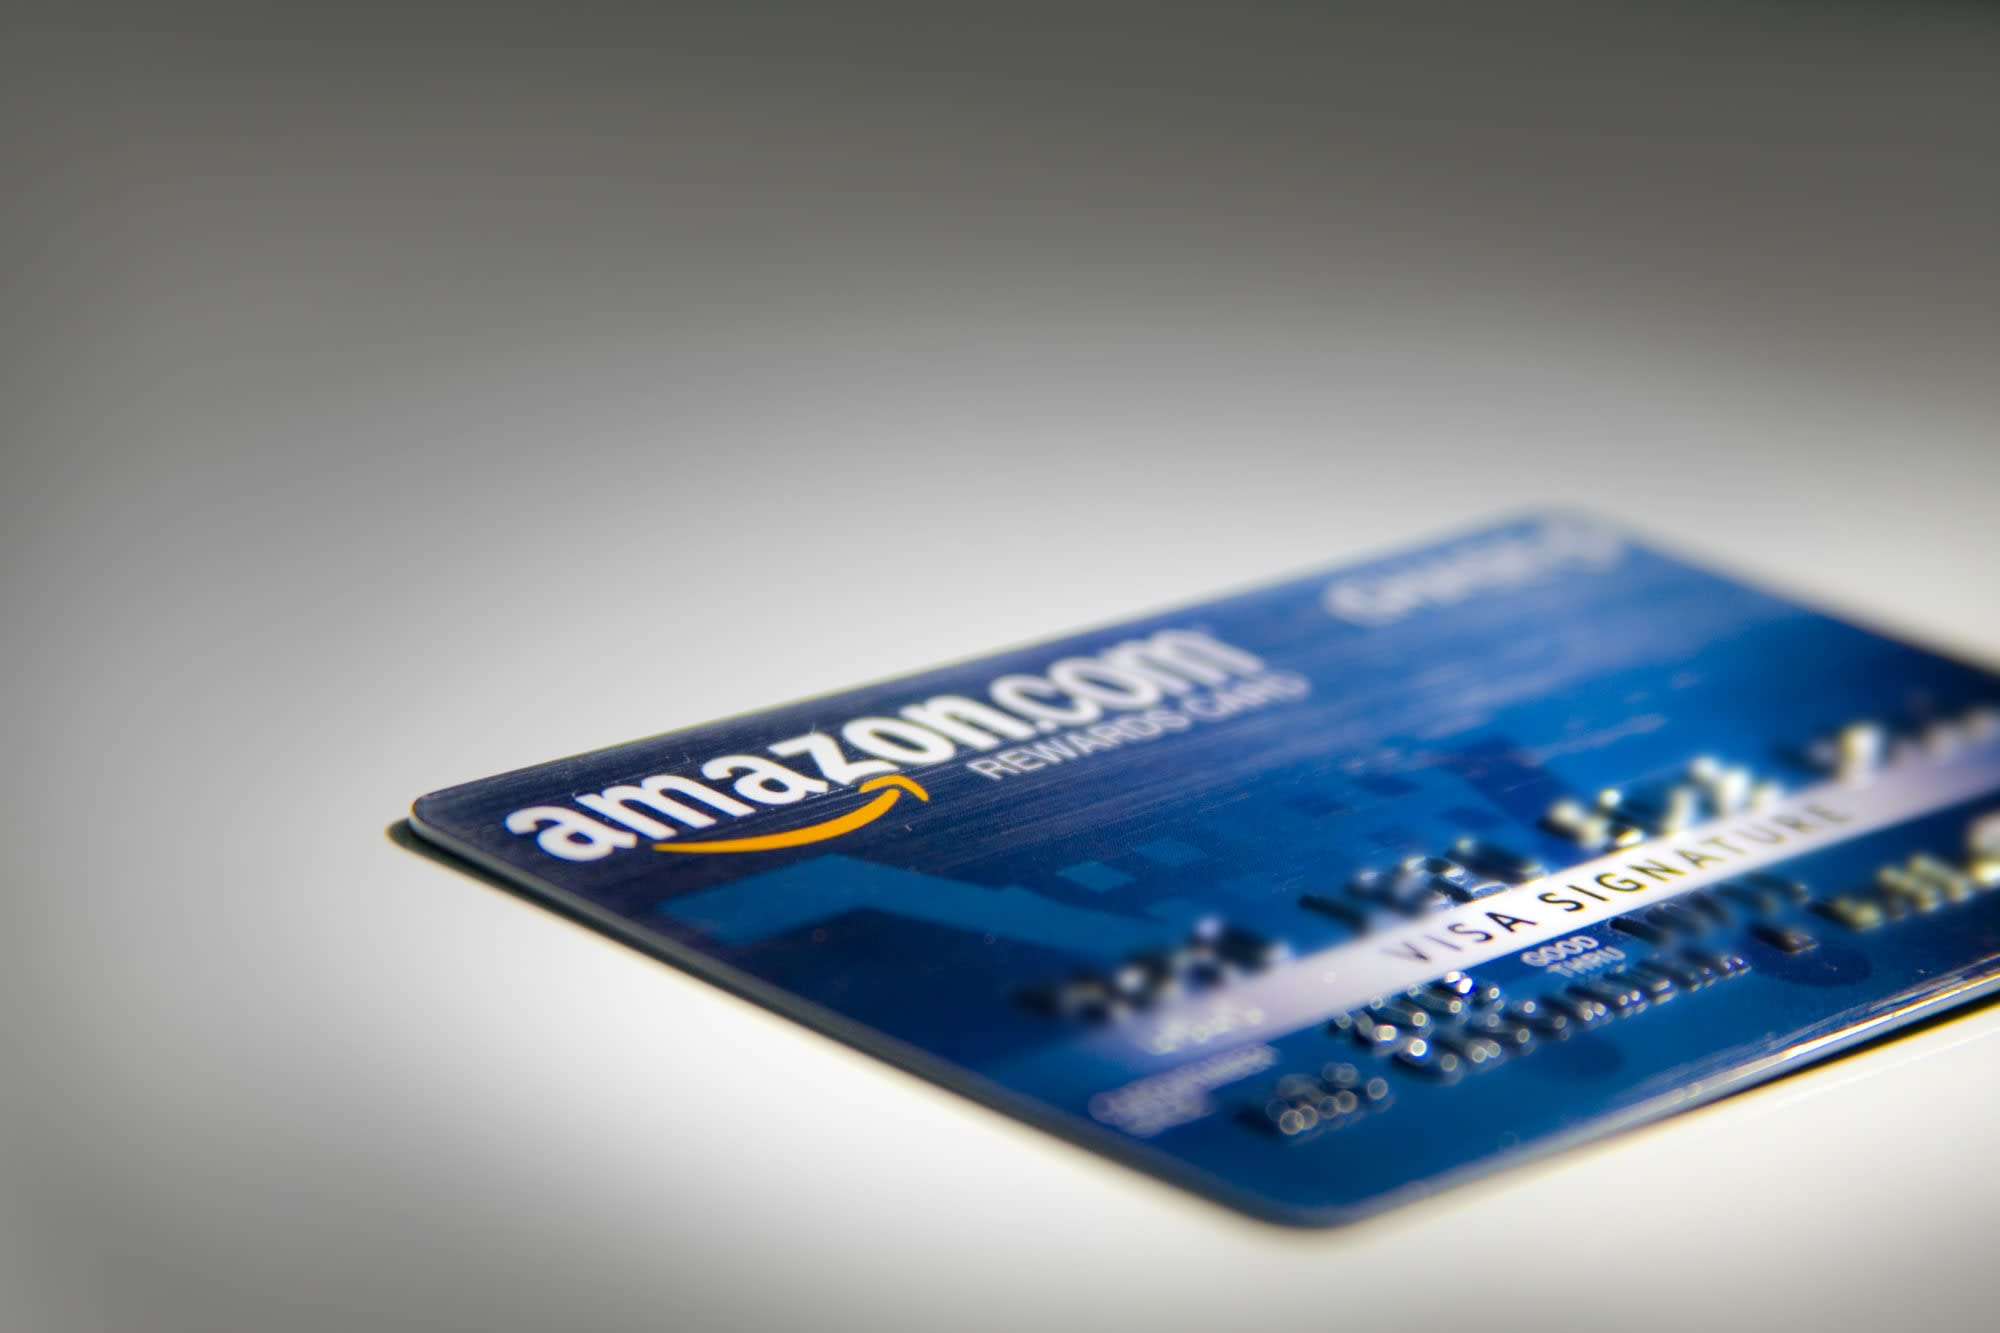 Amazon.com credit card